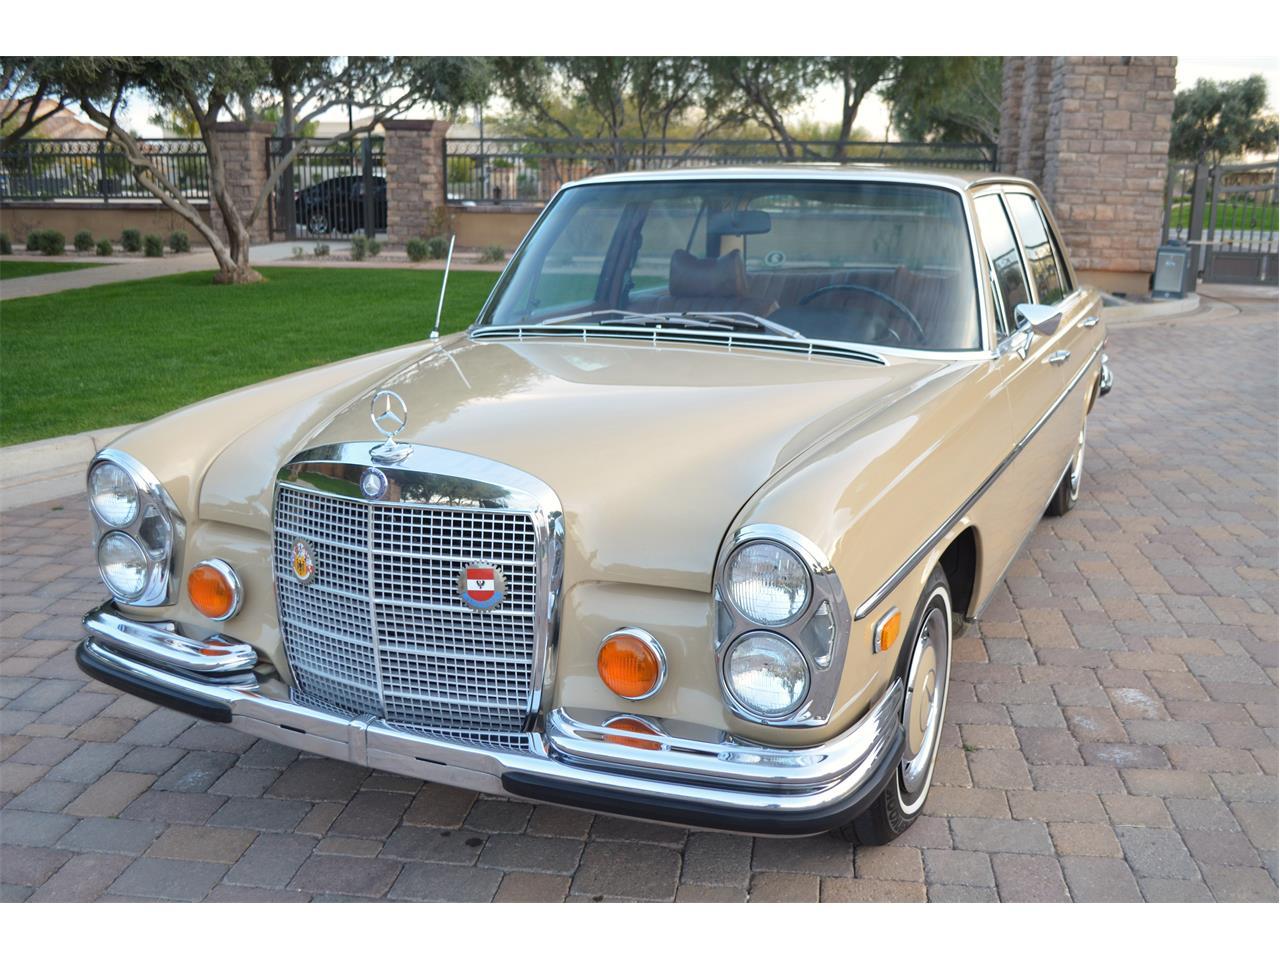 1973 Mercedes-Benz 280SEL for sale in Chandler, AZ ...